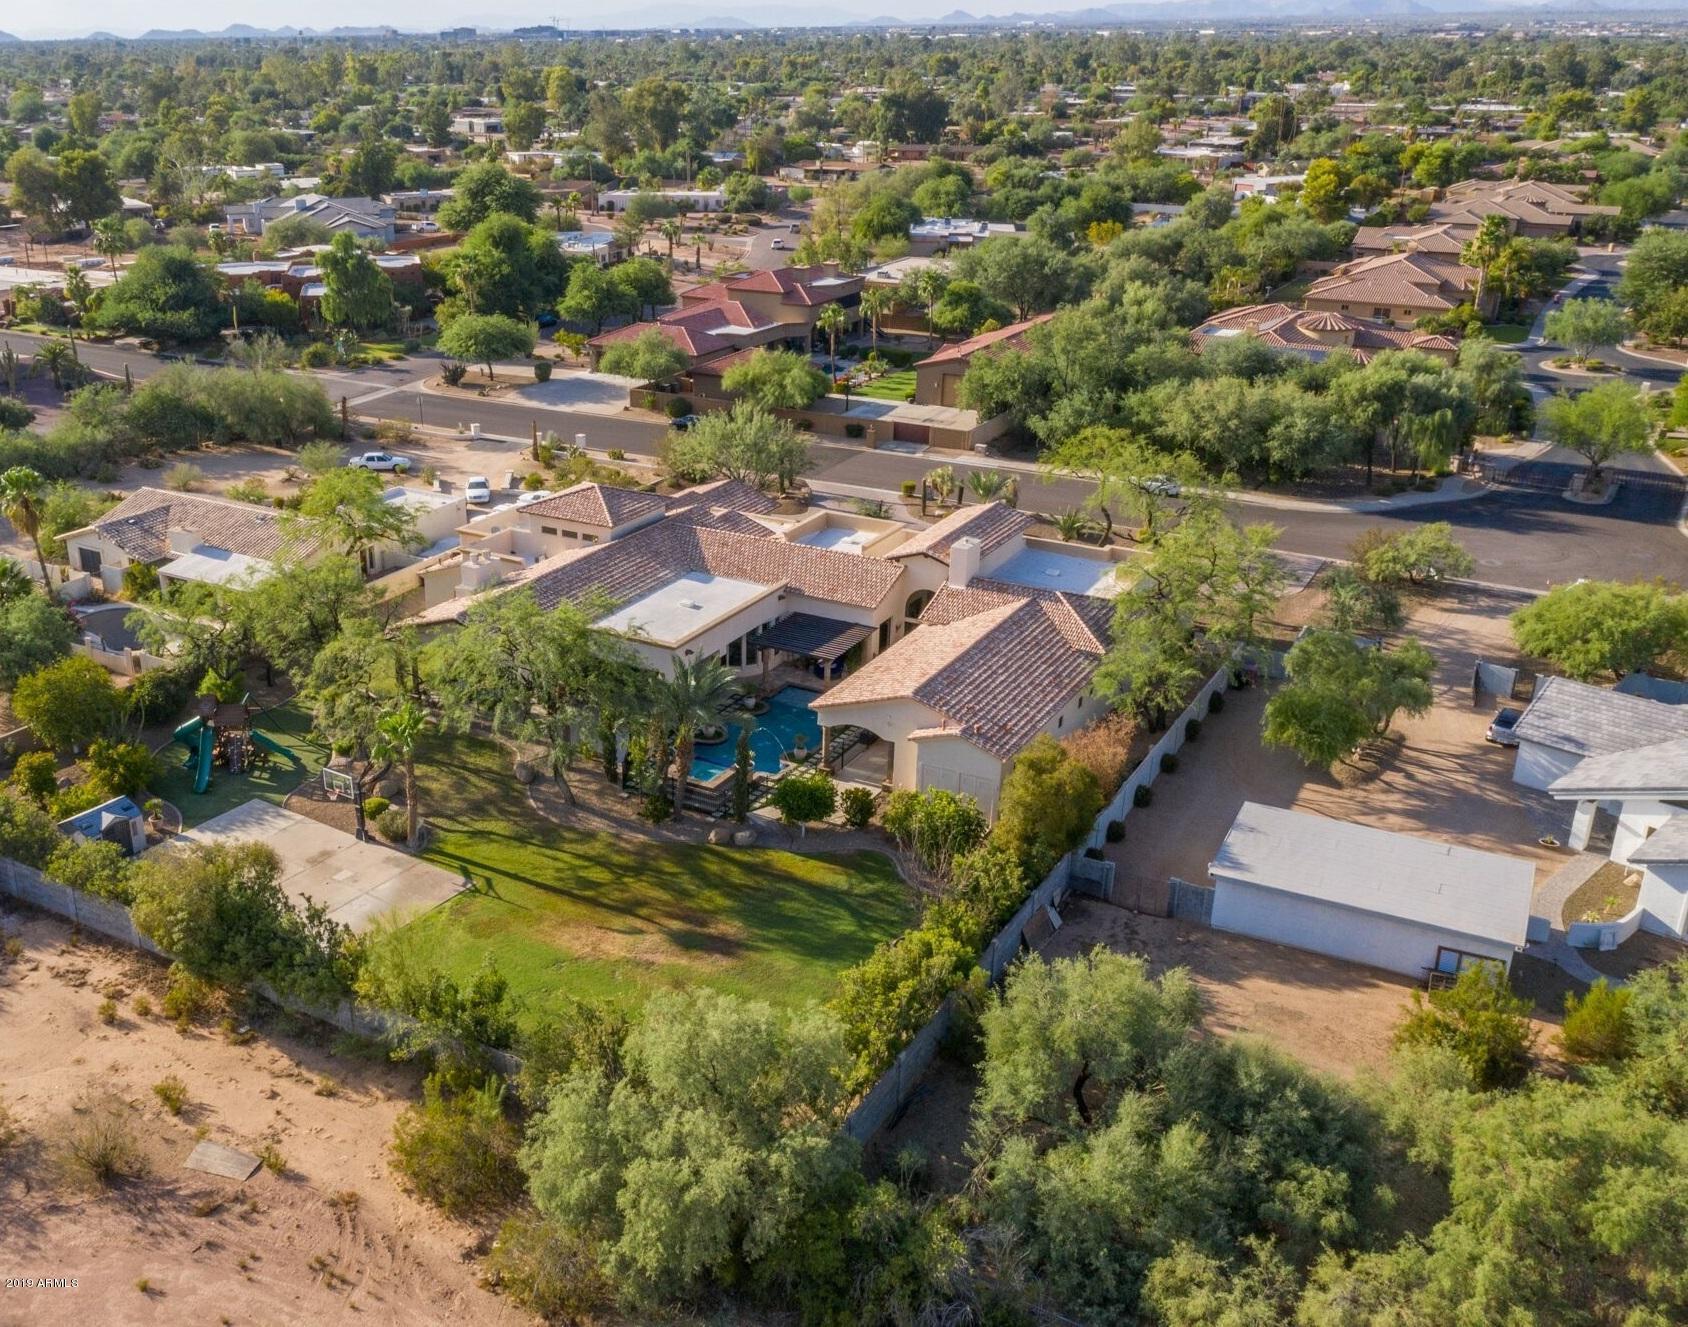 MLS 5971370 8707 E CHOLLA Street, Scottsdale, AZ 85260 Scottsdale AZ Private Pool